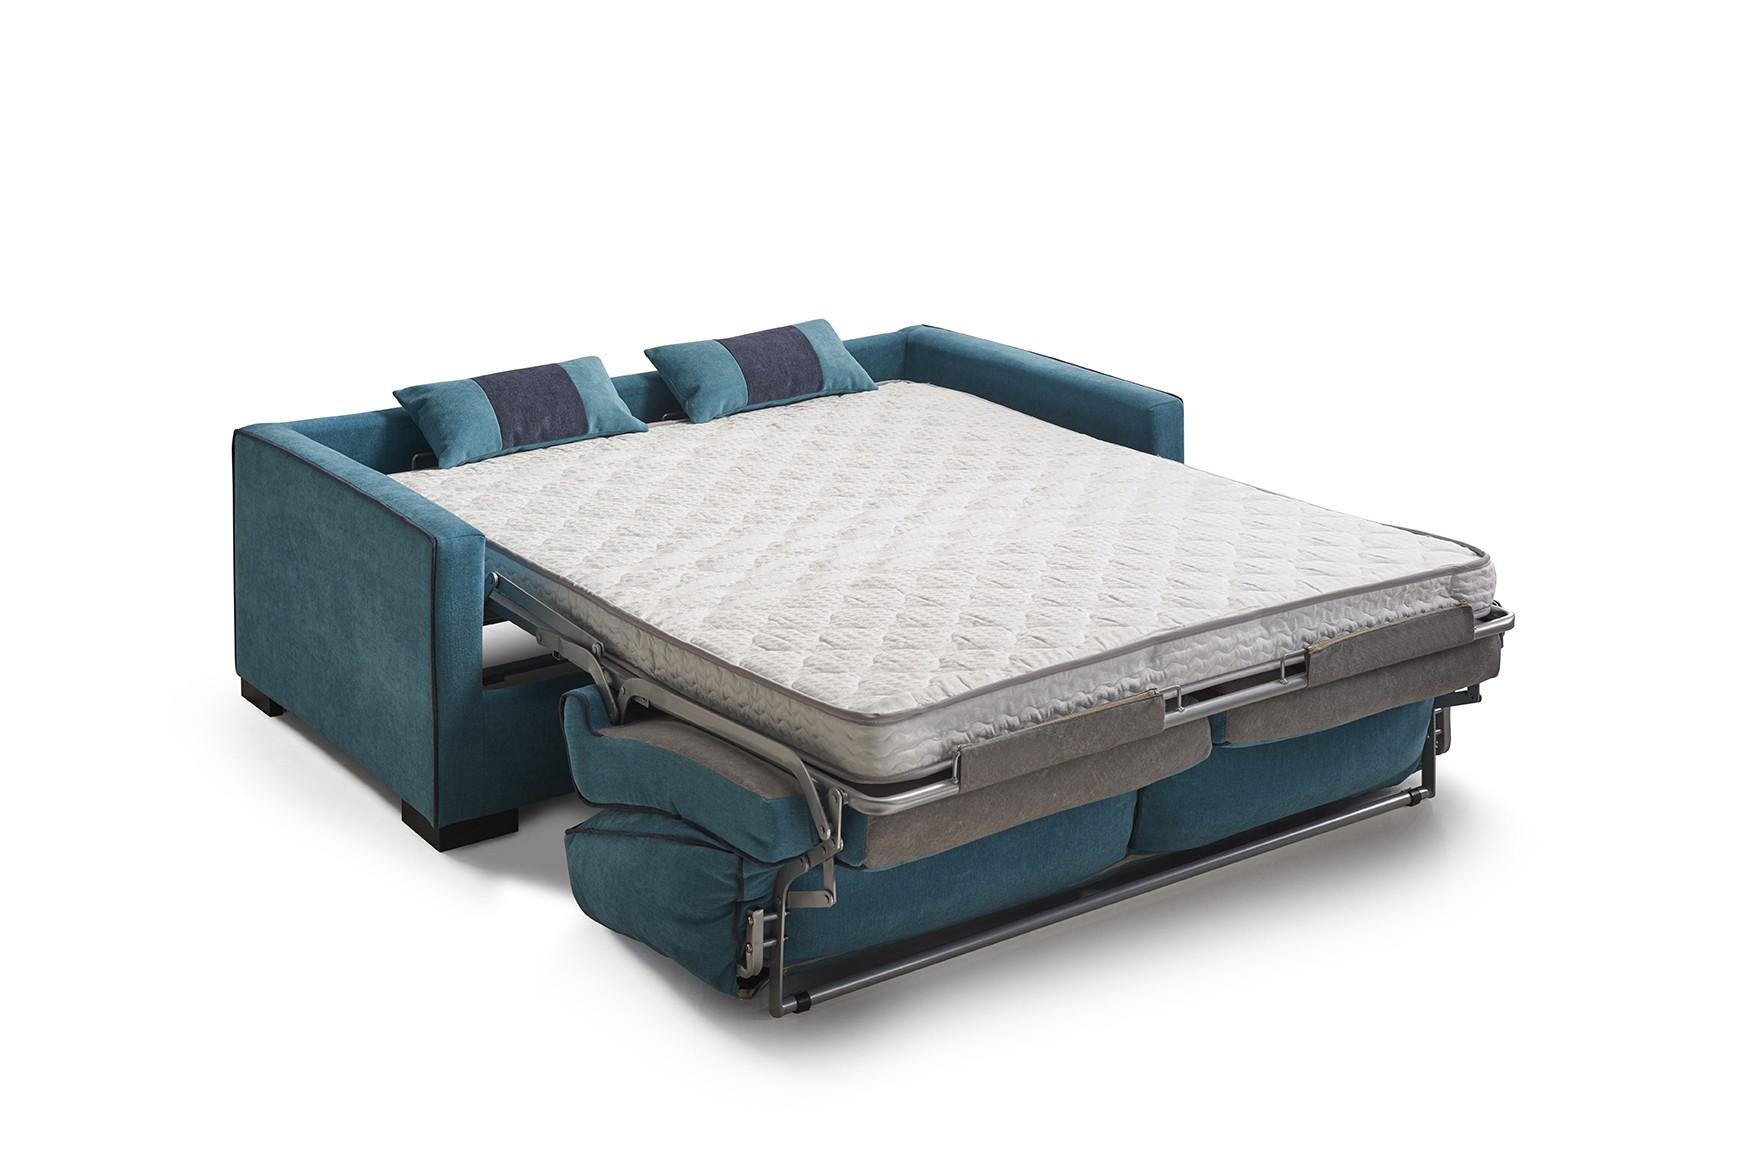 Sofagrup sofa cama London abierto